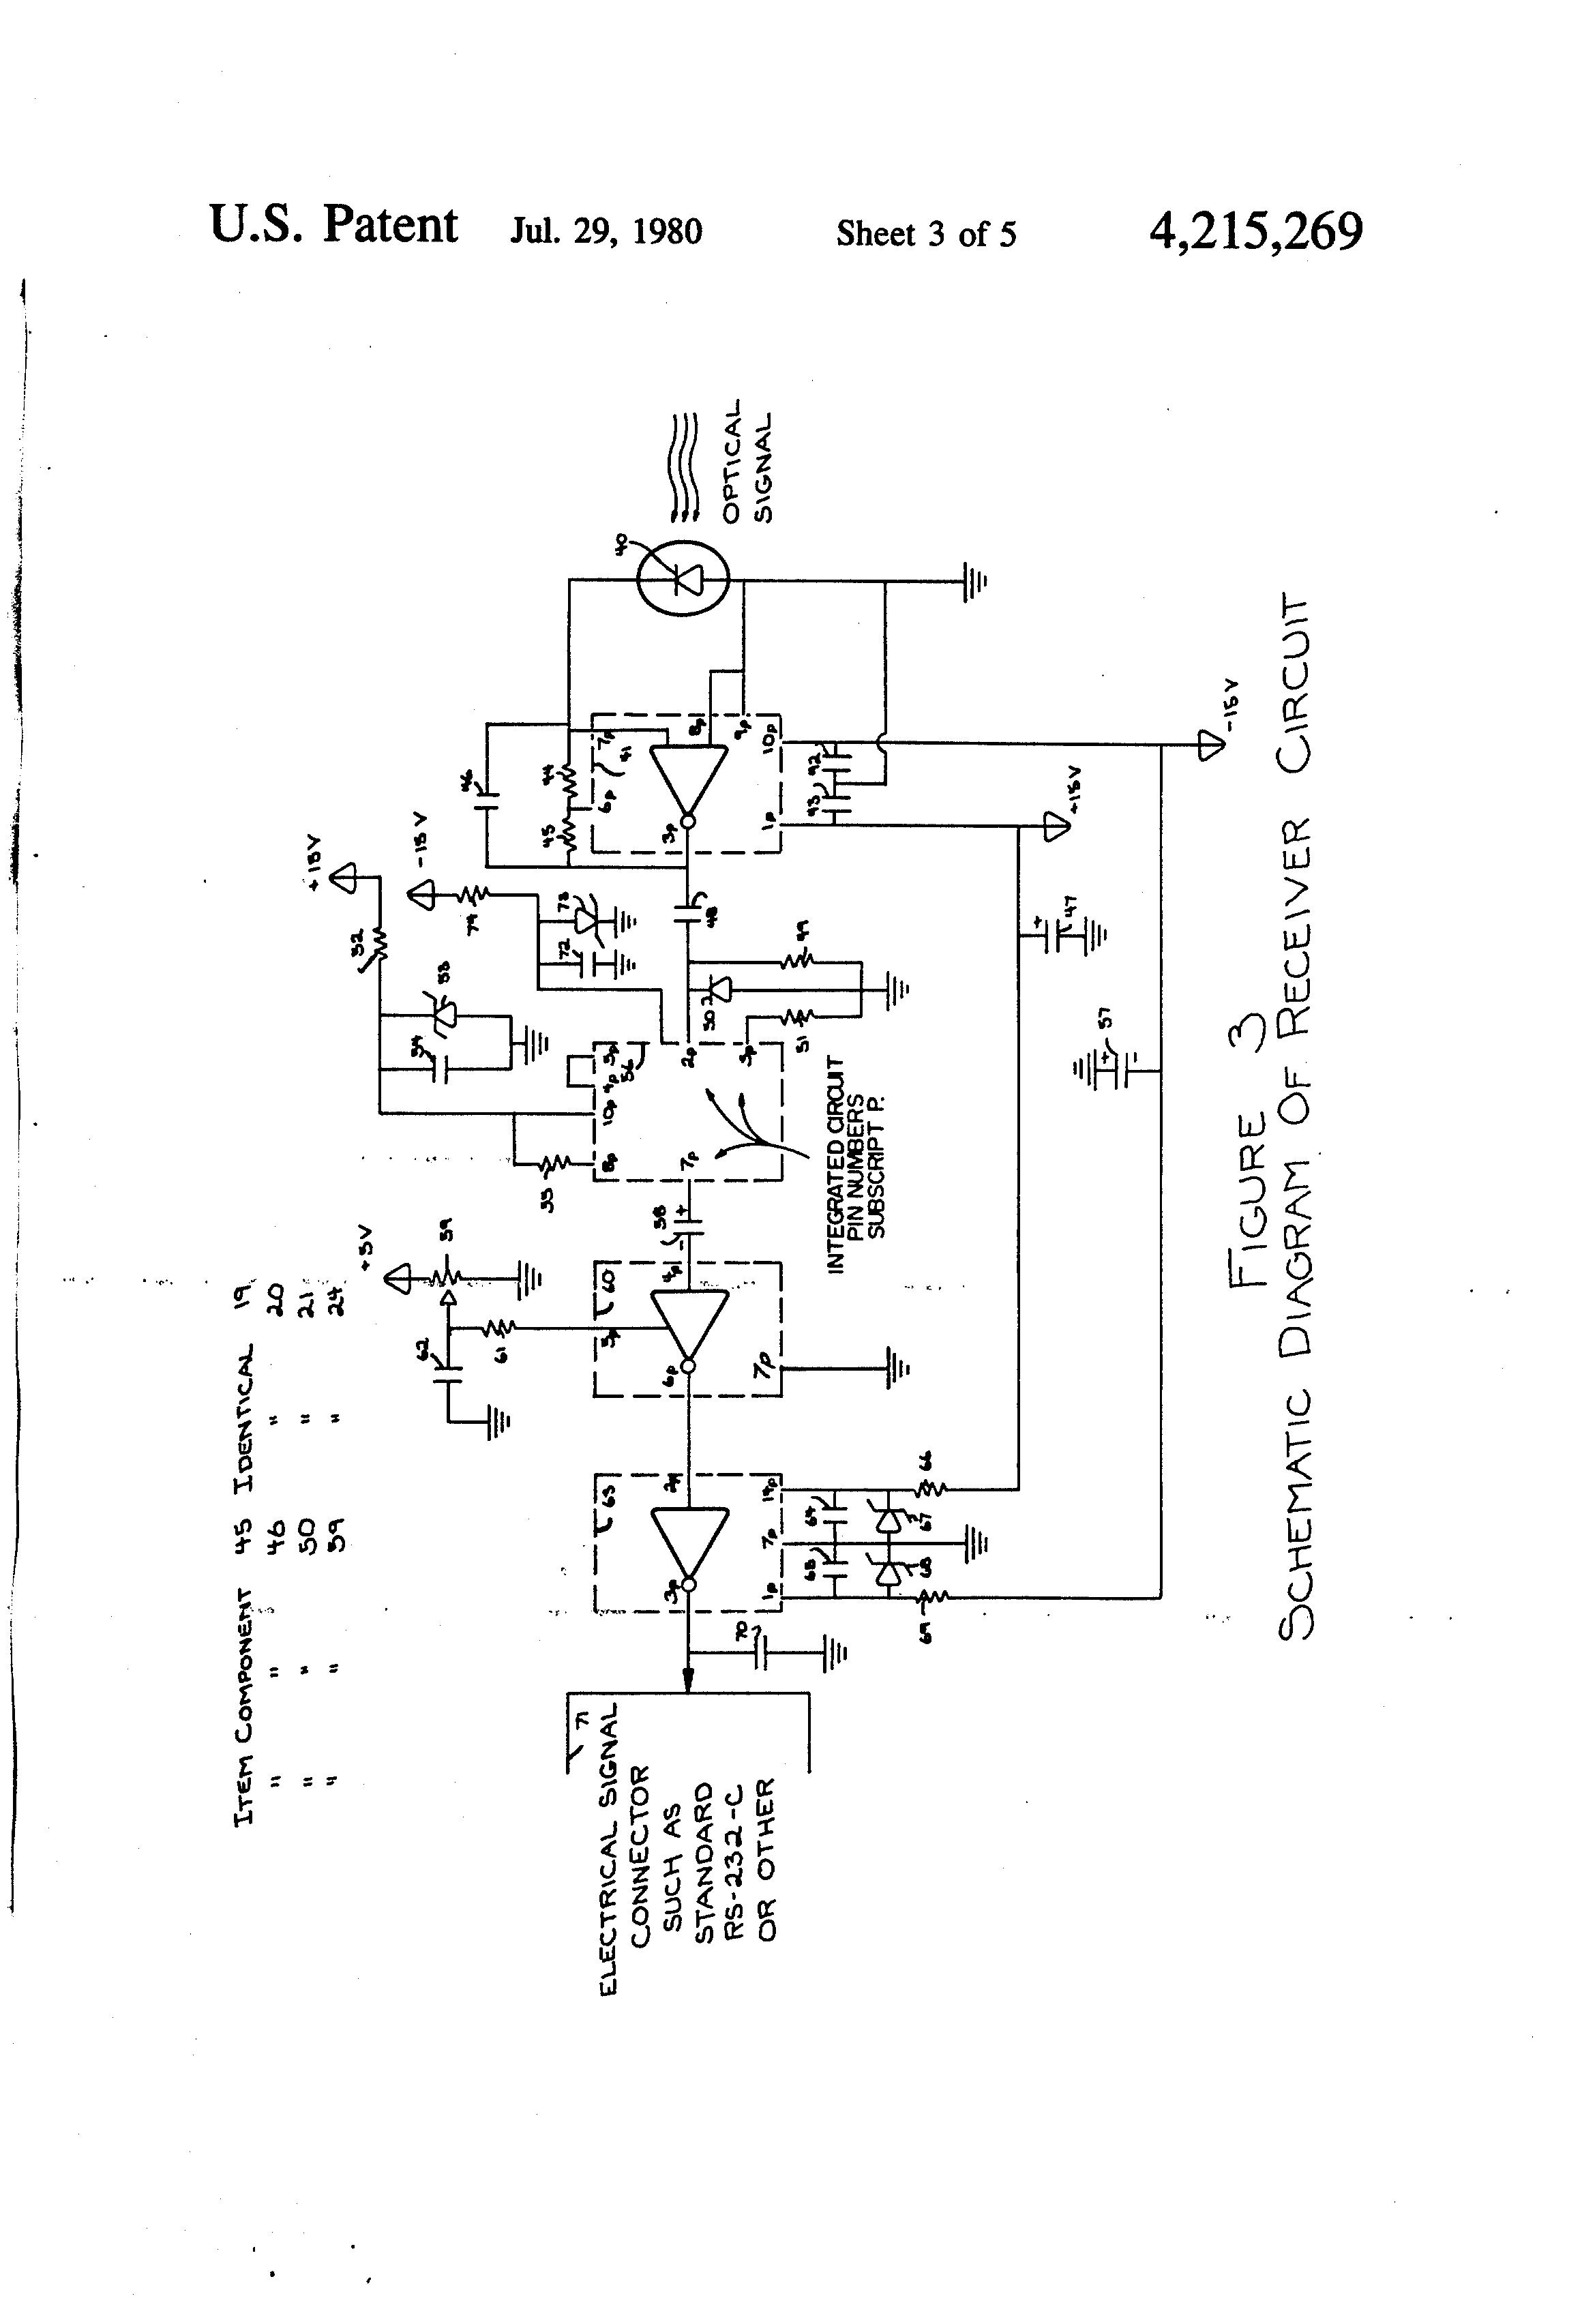 Patent Us4215269 Fiber Optic Modem Data Set Google Patents Optics Integrated Circuits Images Buy Drawing